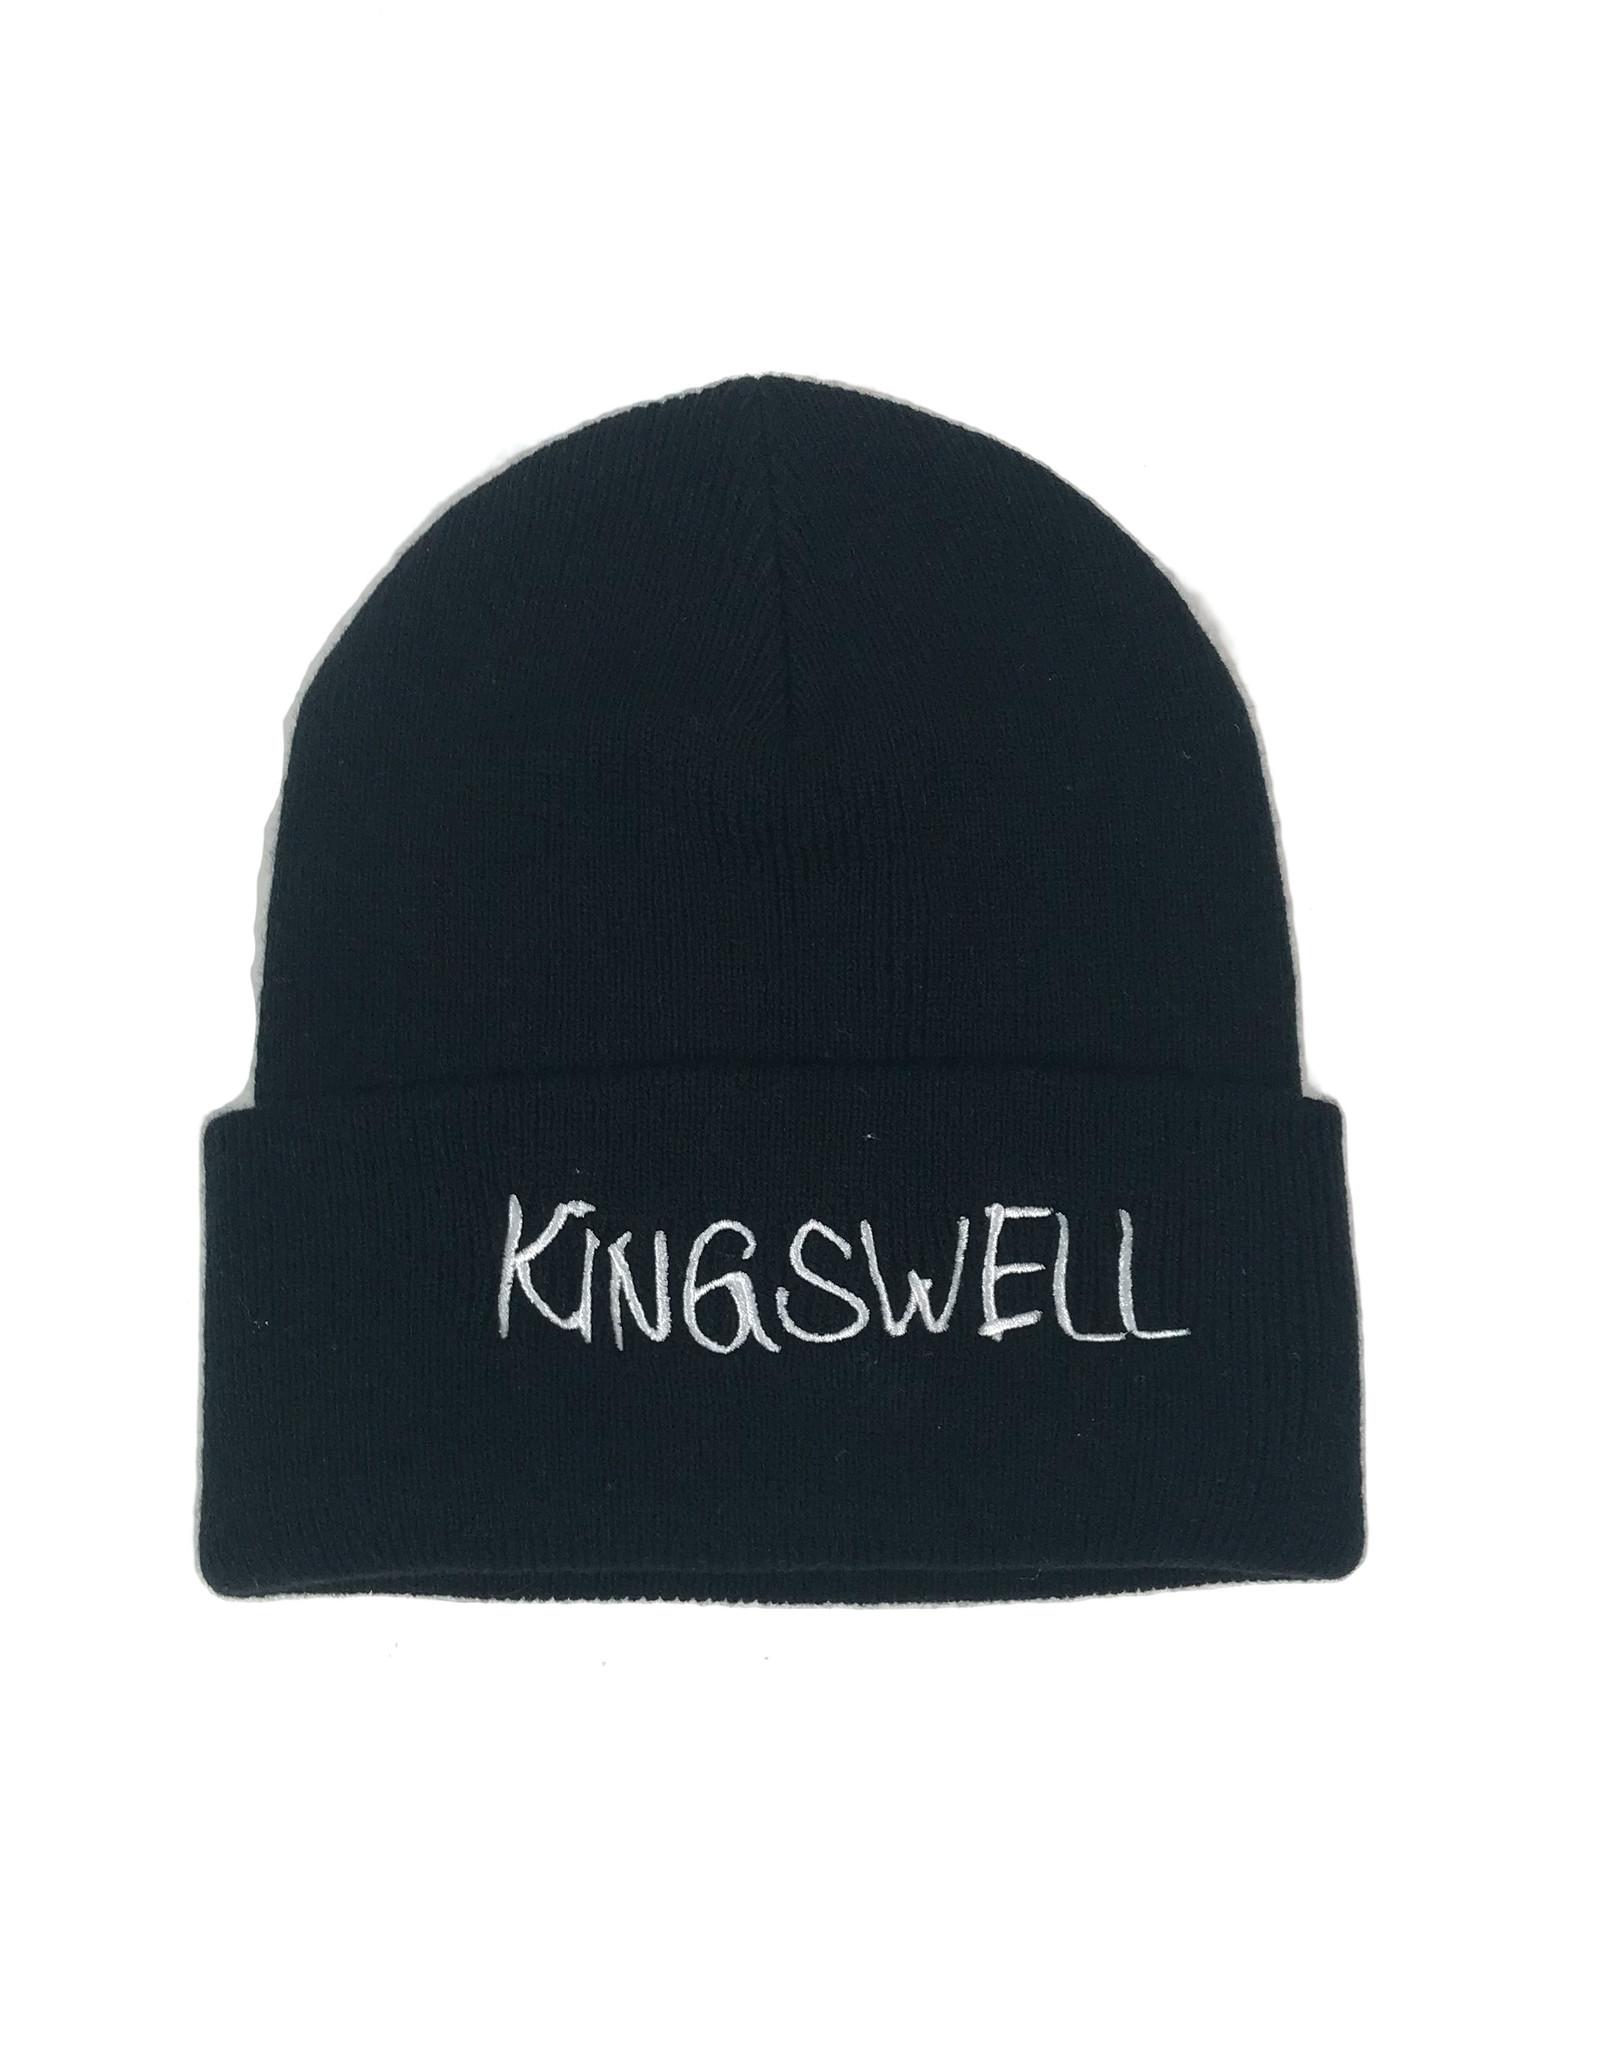 KINGSWELL KINGSWELL GONZ LOGO BEANIE - BLACK